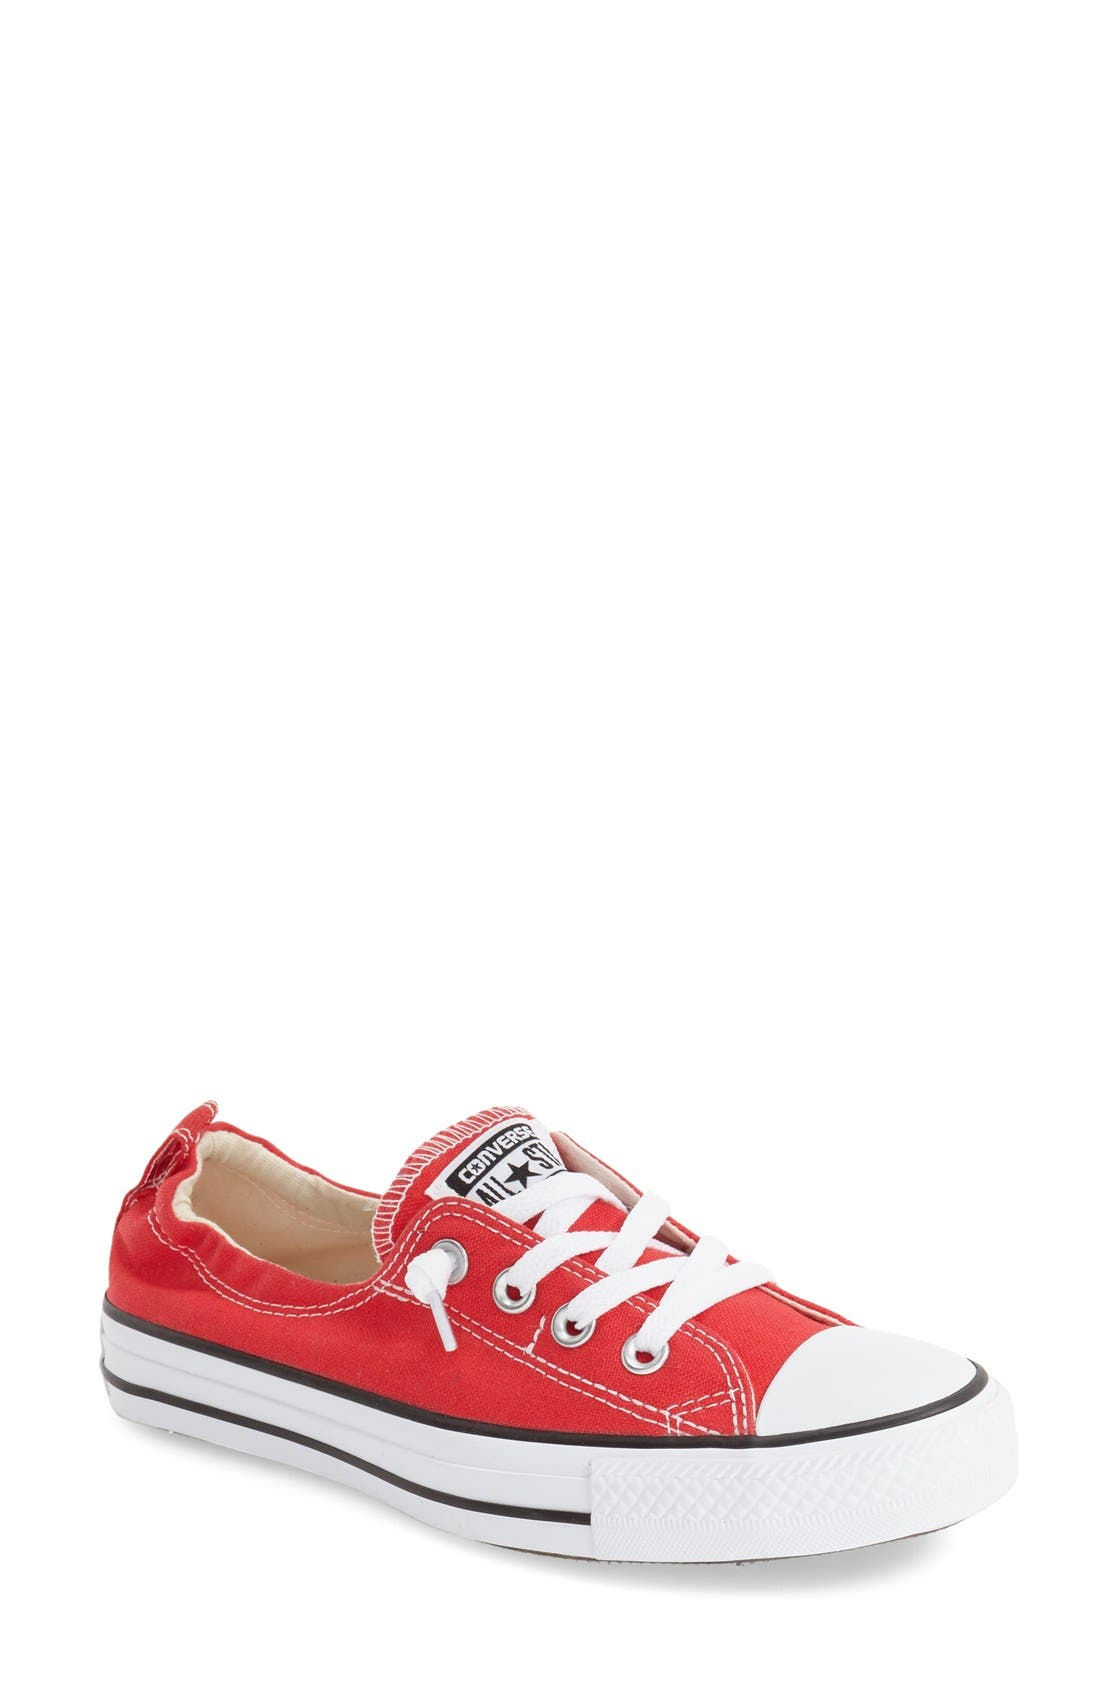 Chuck Taylor<sup>®</sup> Shoreline Sneaker,                         Main,                         color,